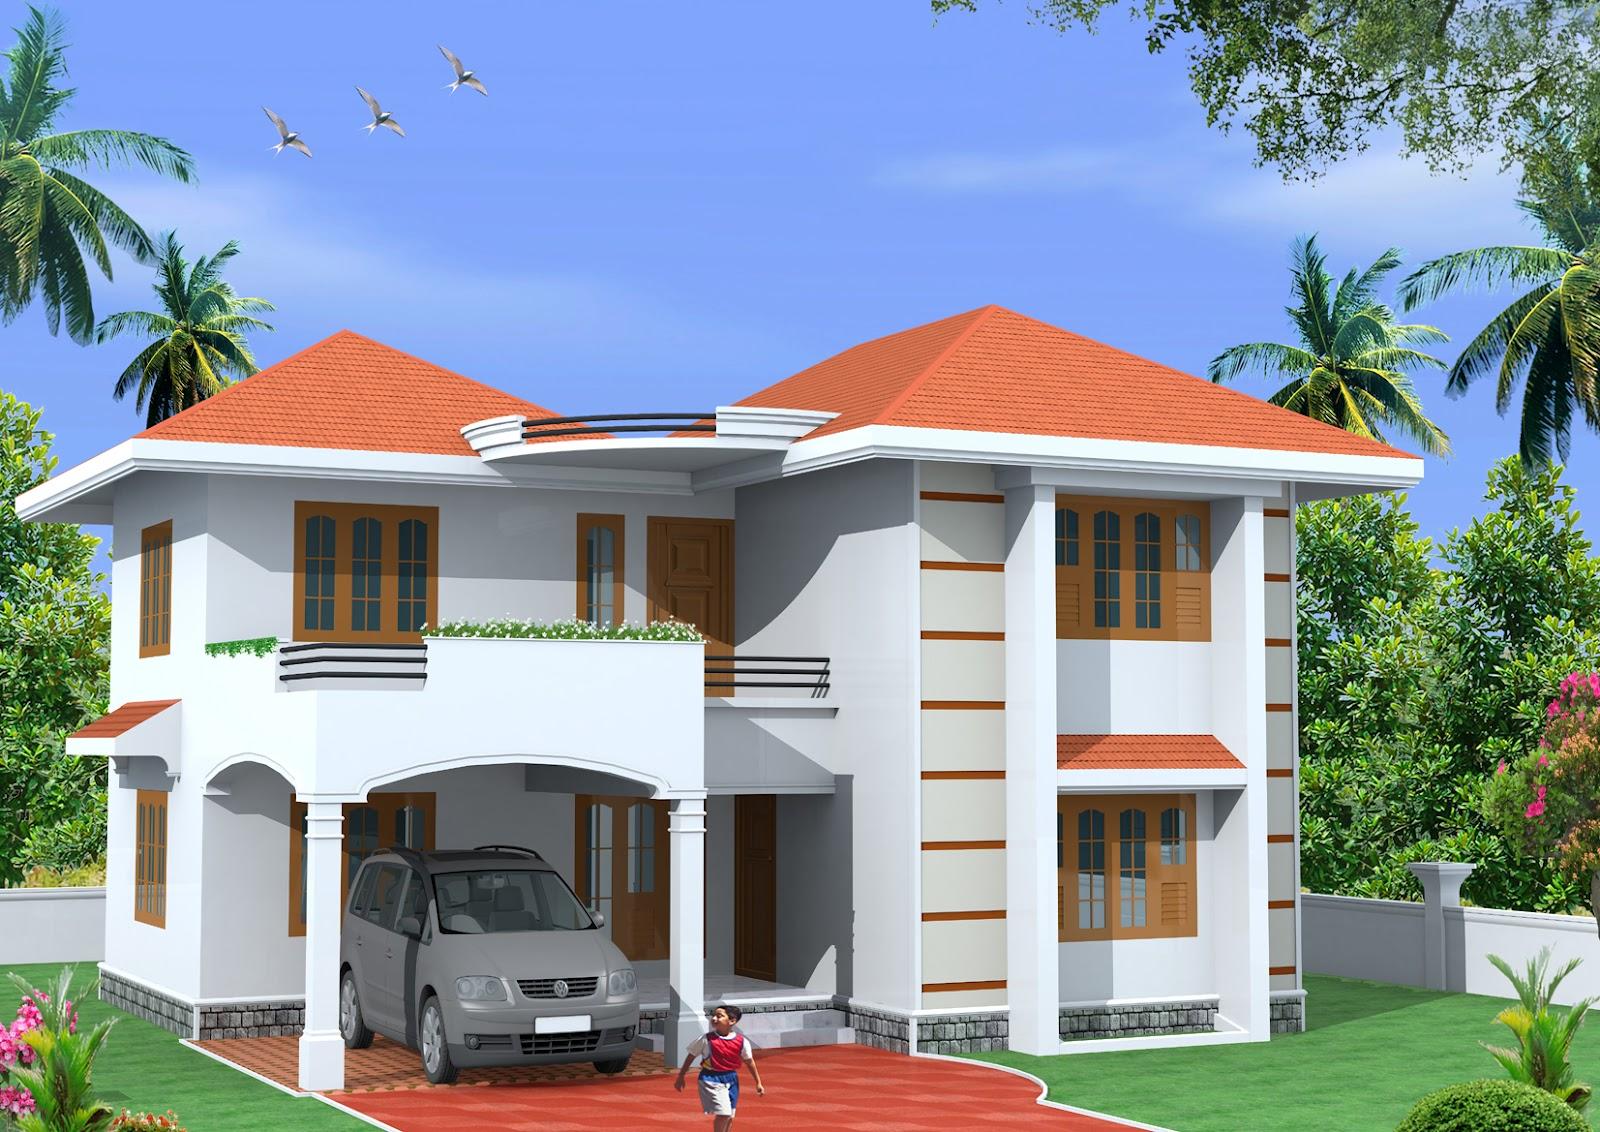 Green Homes 1800 2 Storey Home Design